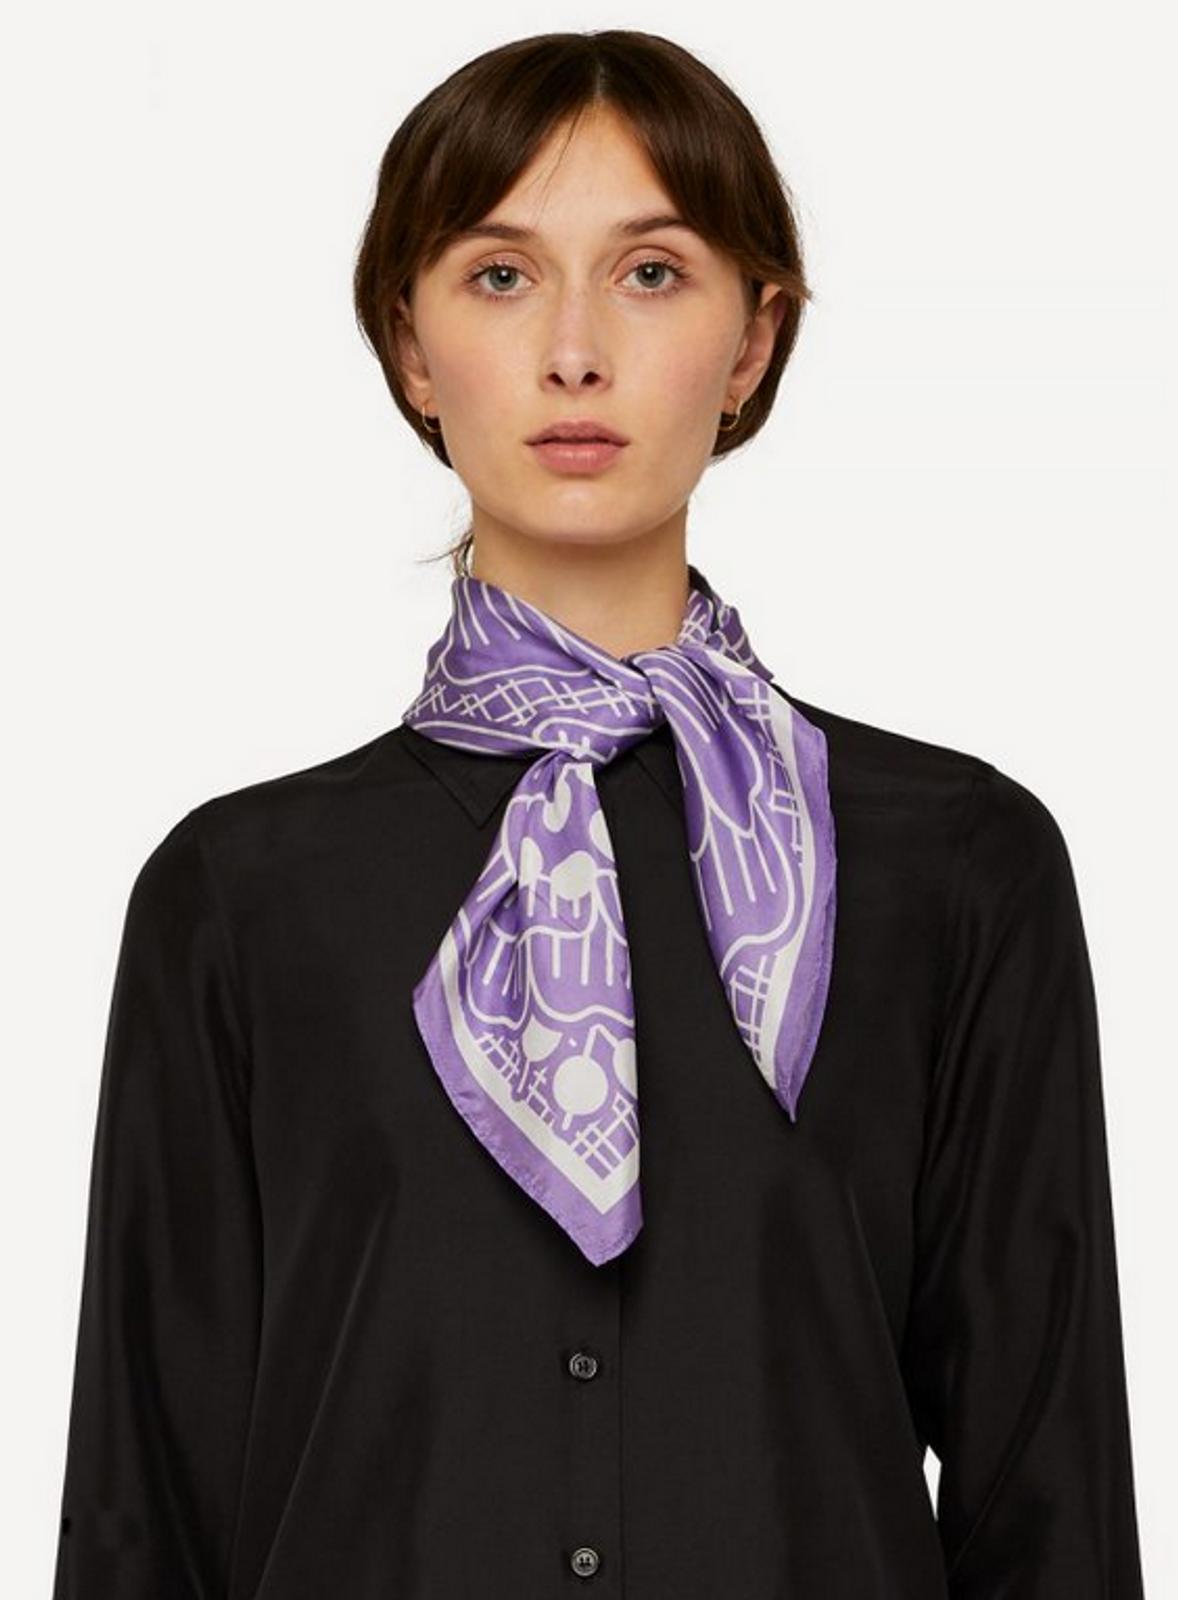 Oleana Romantic and Square Scarf, 519-C Soft Lavender